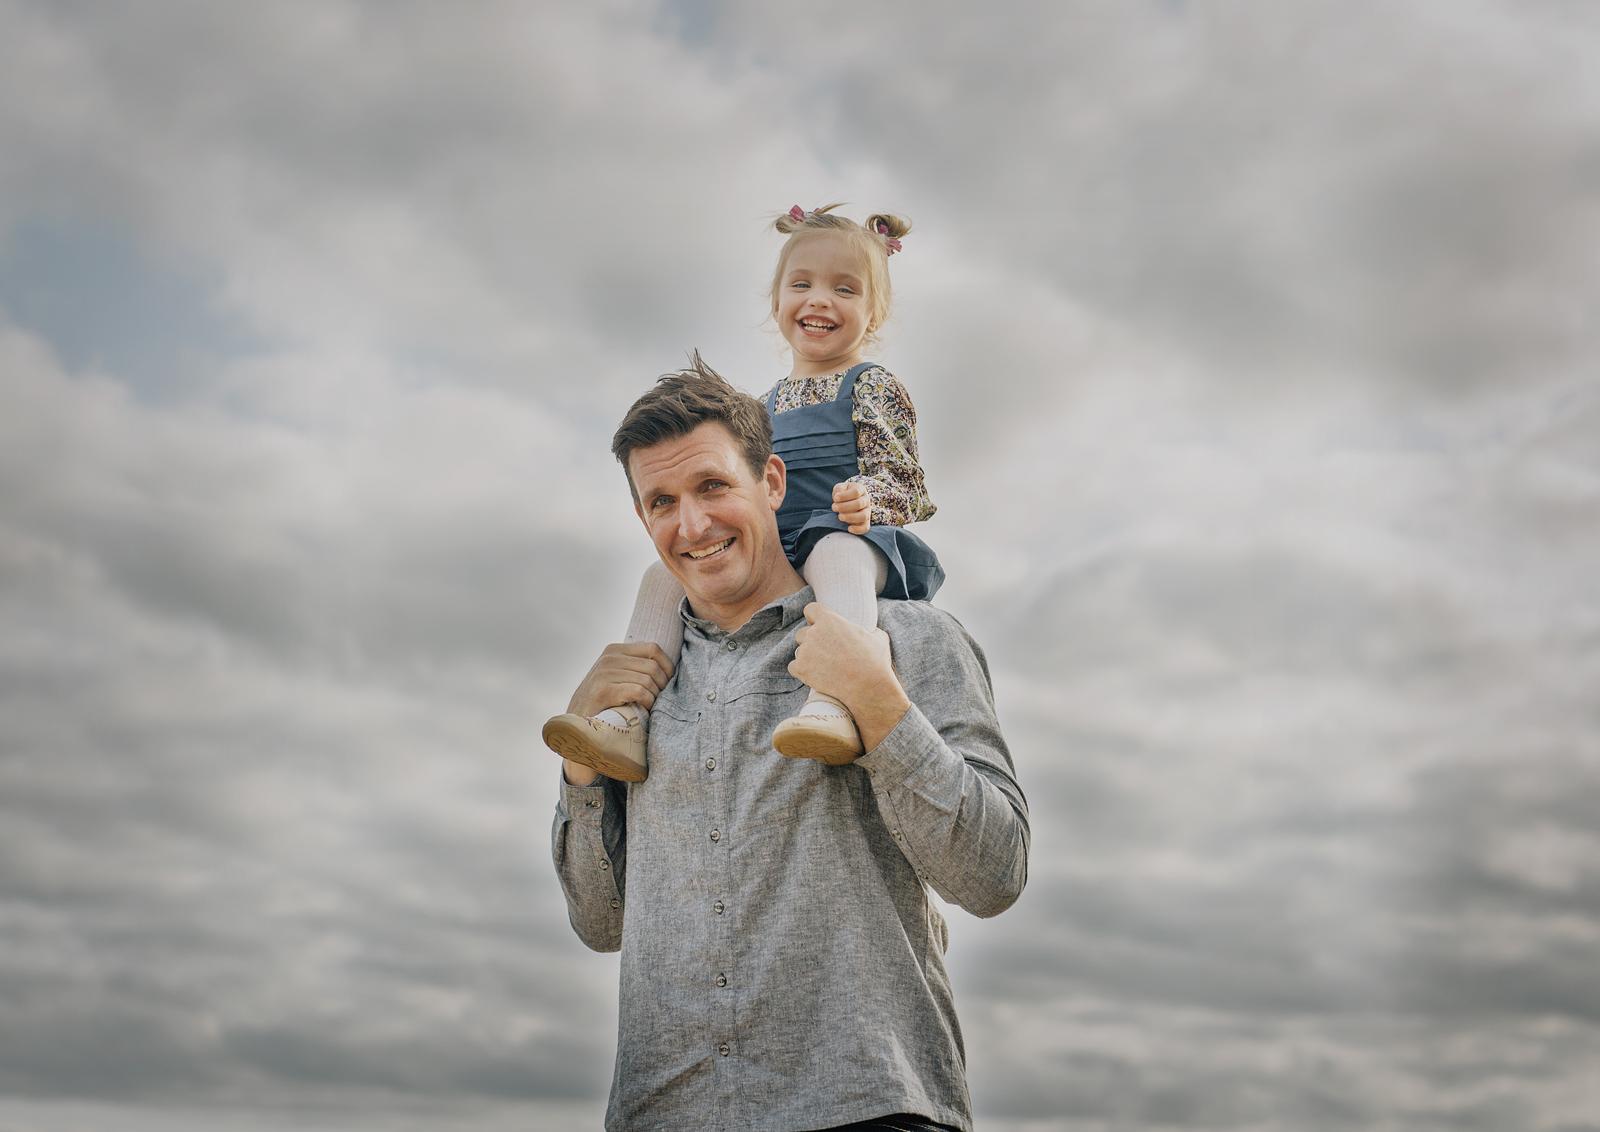 Toddler on her Dad's shoulders